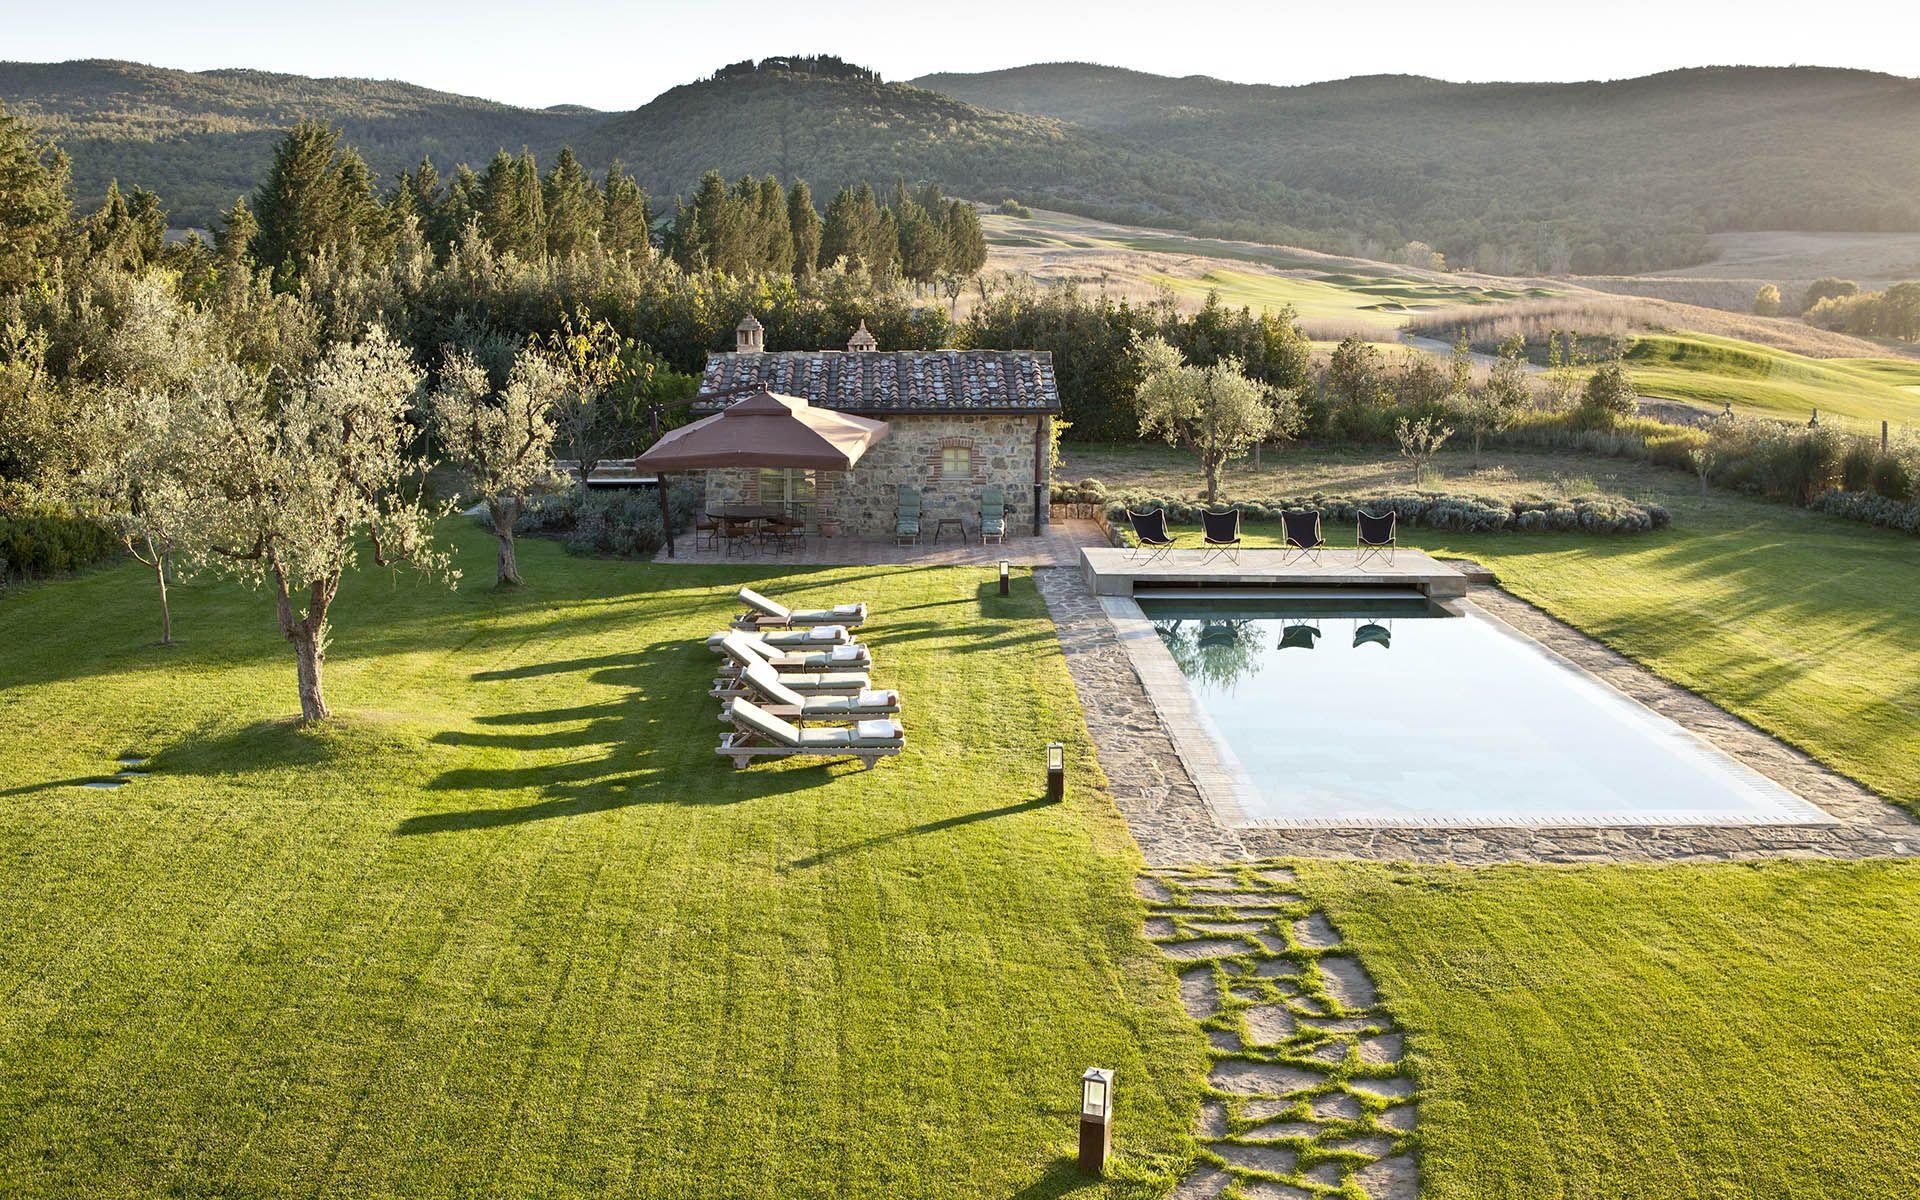 Luxury Villa Villa Biondi Tuscany Italy Europe Photo